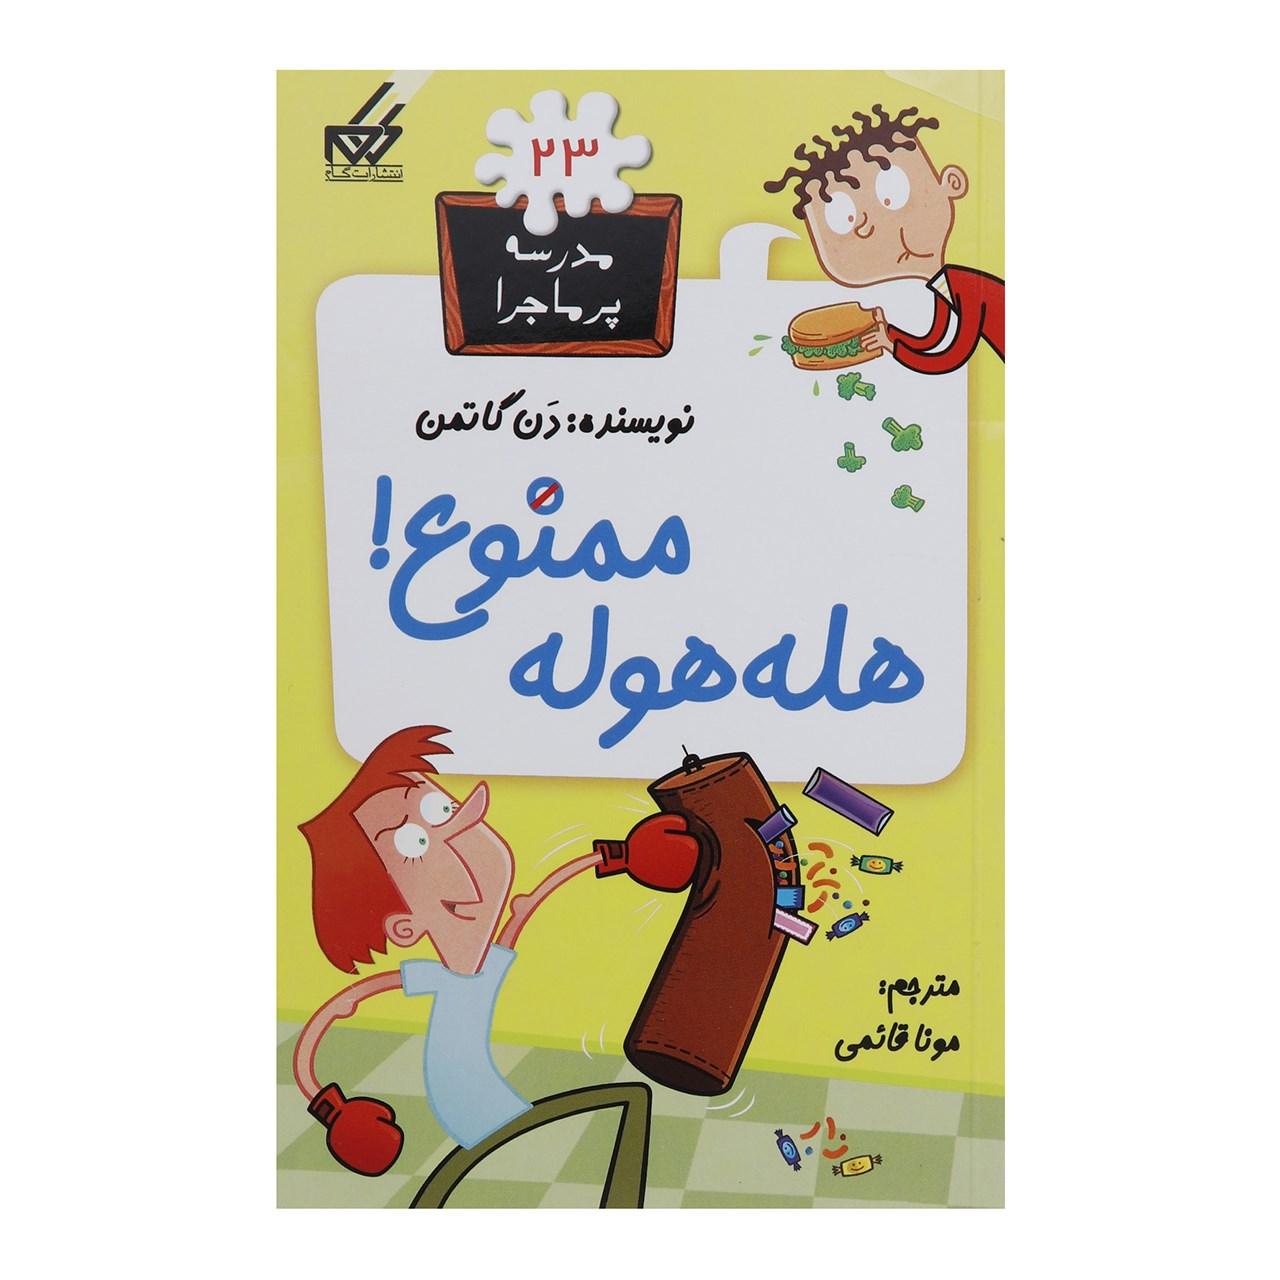 خرید                      کتاب مدرسه پر ماجرا 23 هله هوله ممنوع اثر دن گاتمن